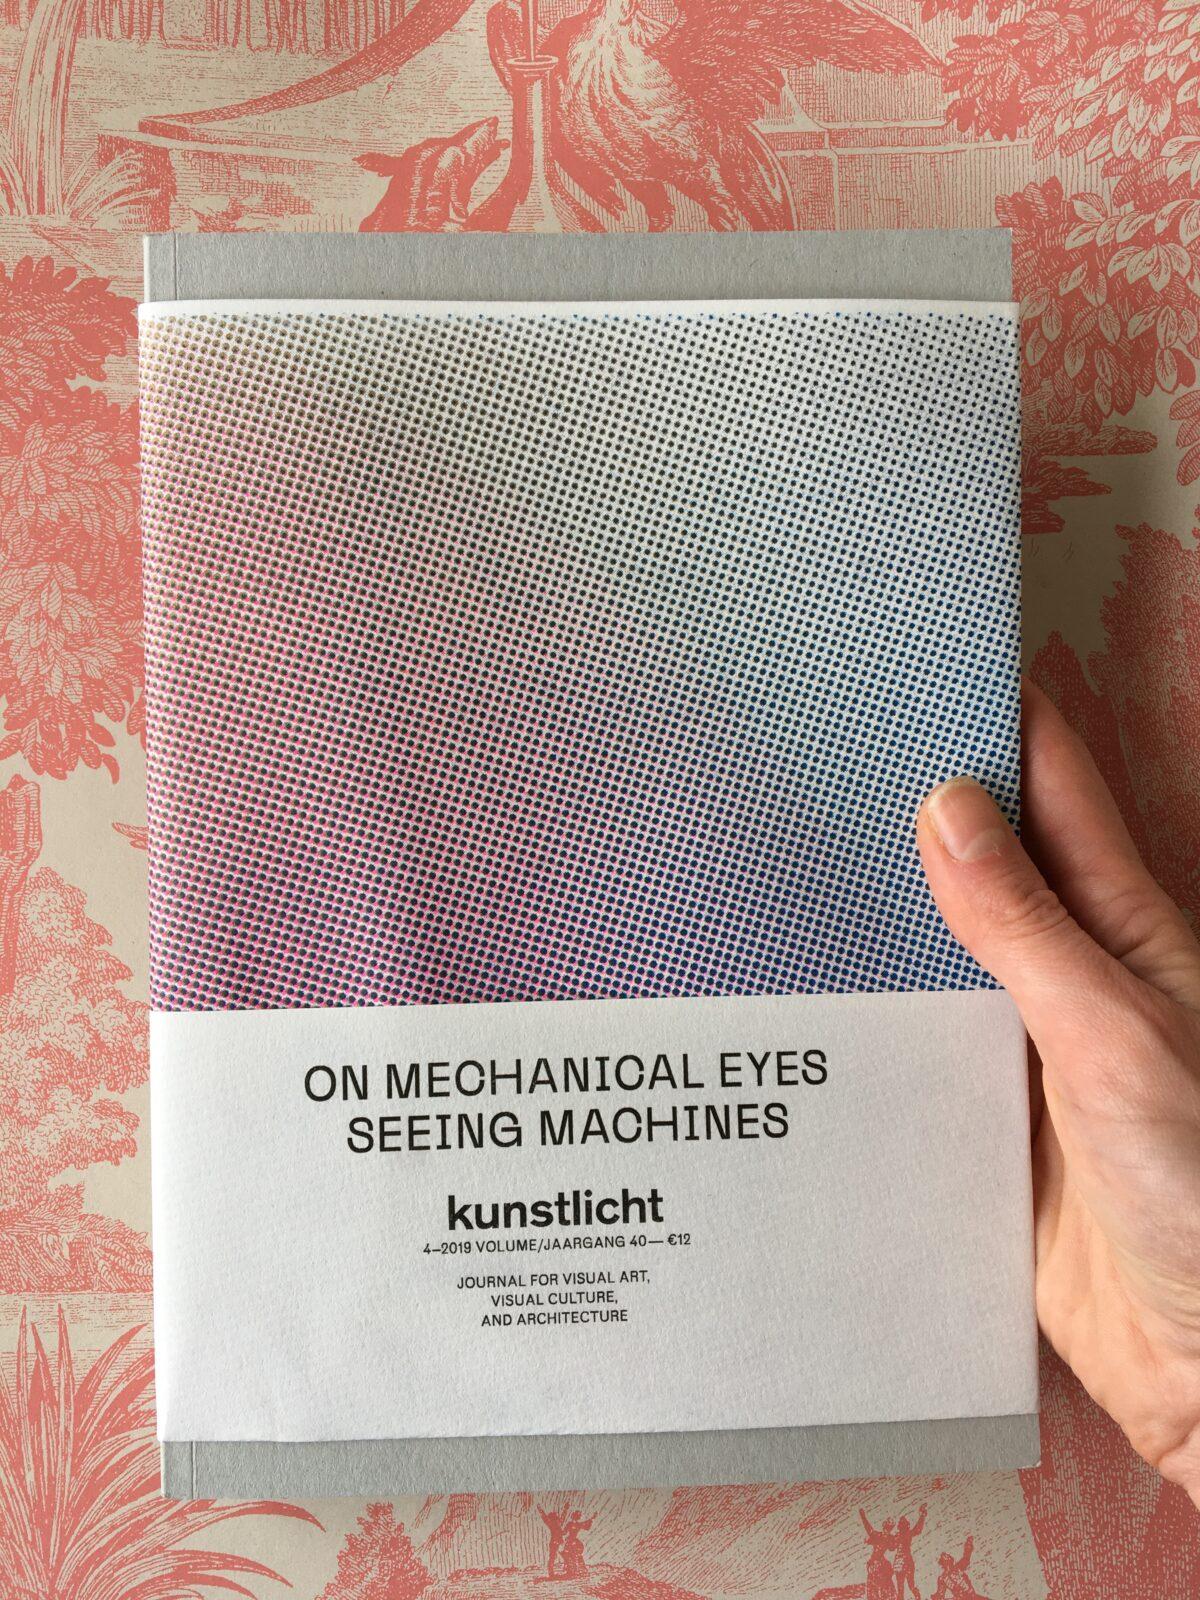 VOL. 40 NO. 4, 2019, ON MECHANICAL EYES: SEEING MACHINES